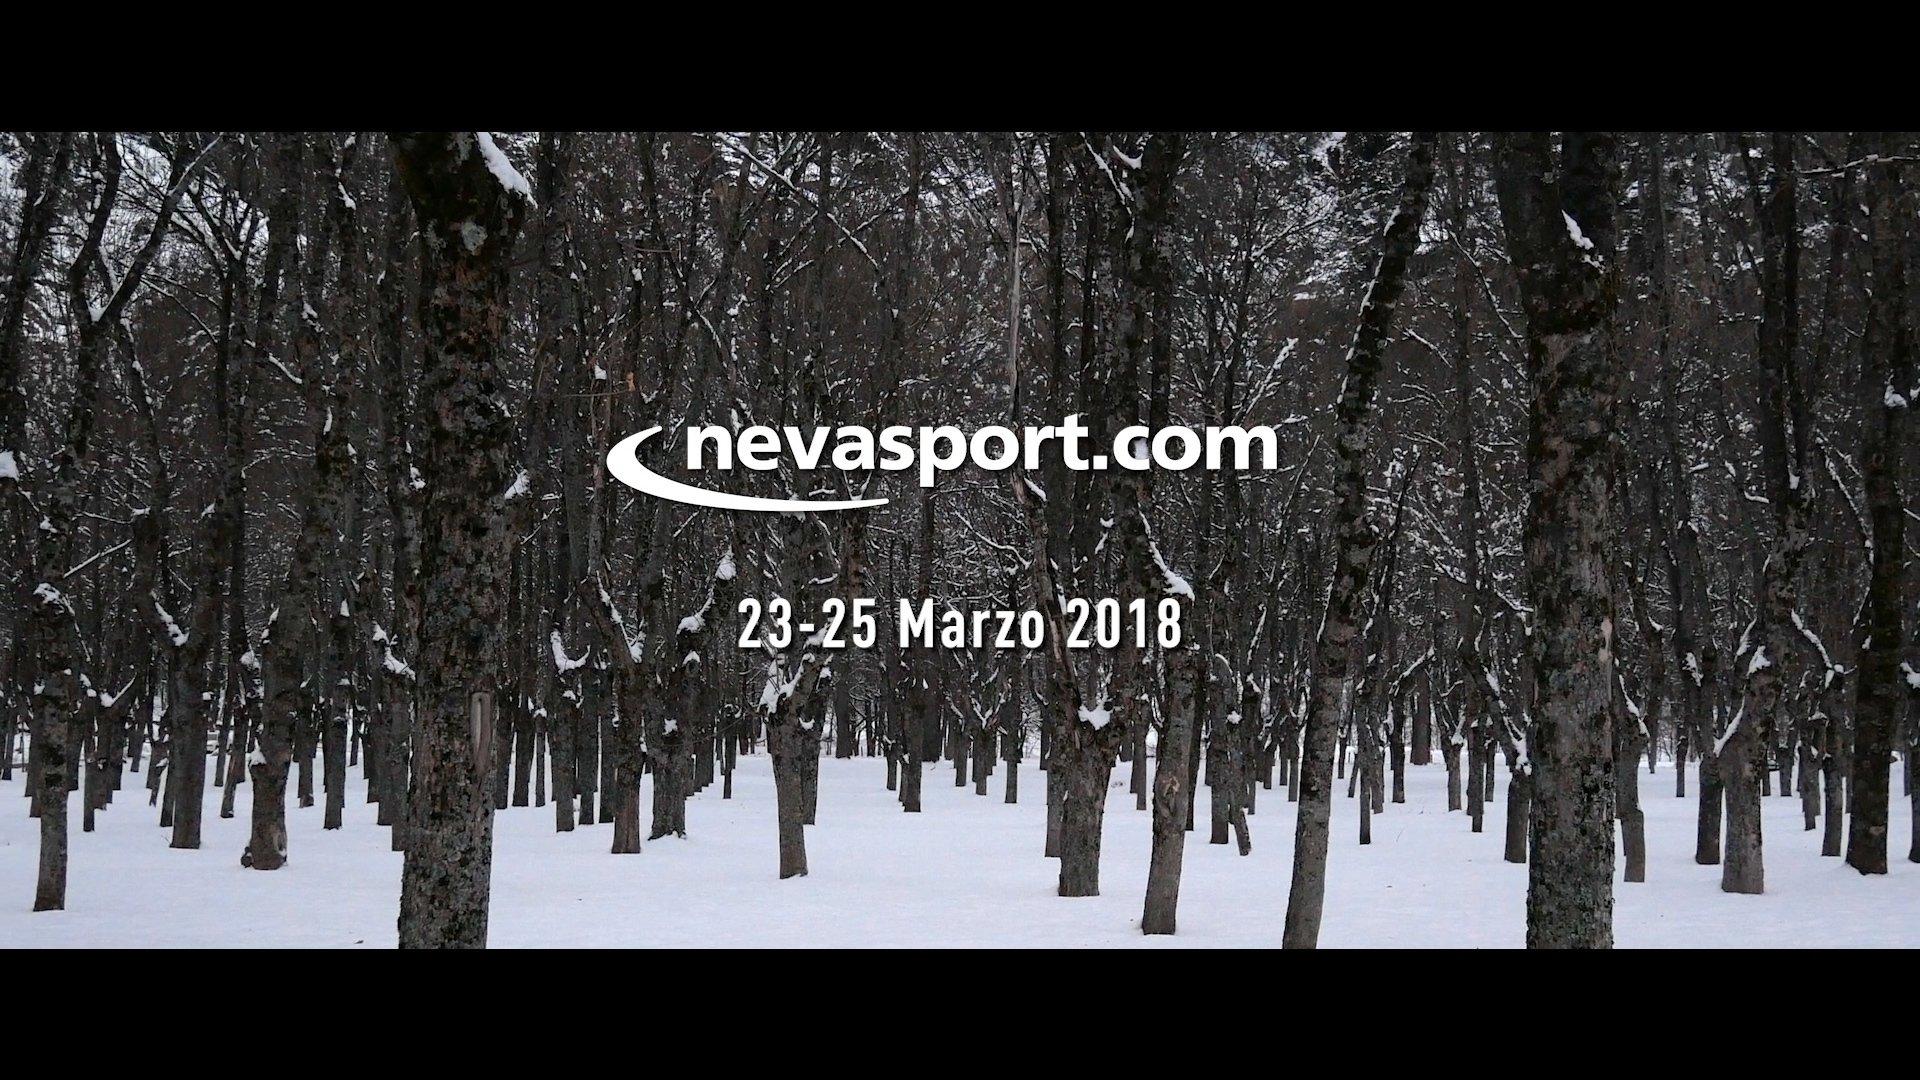 Kedada Nevasport 2018